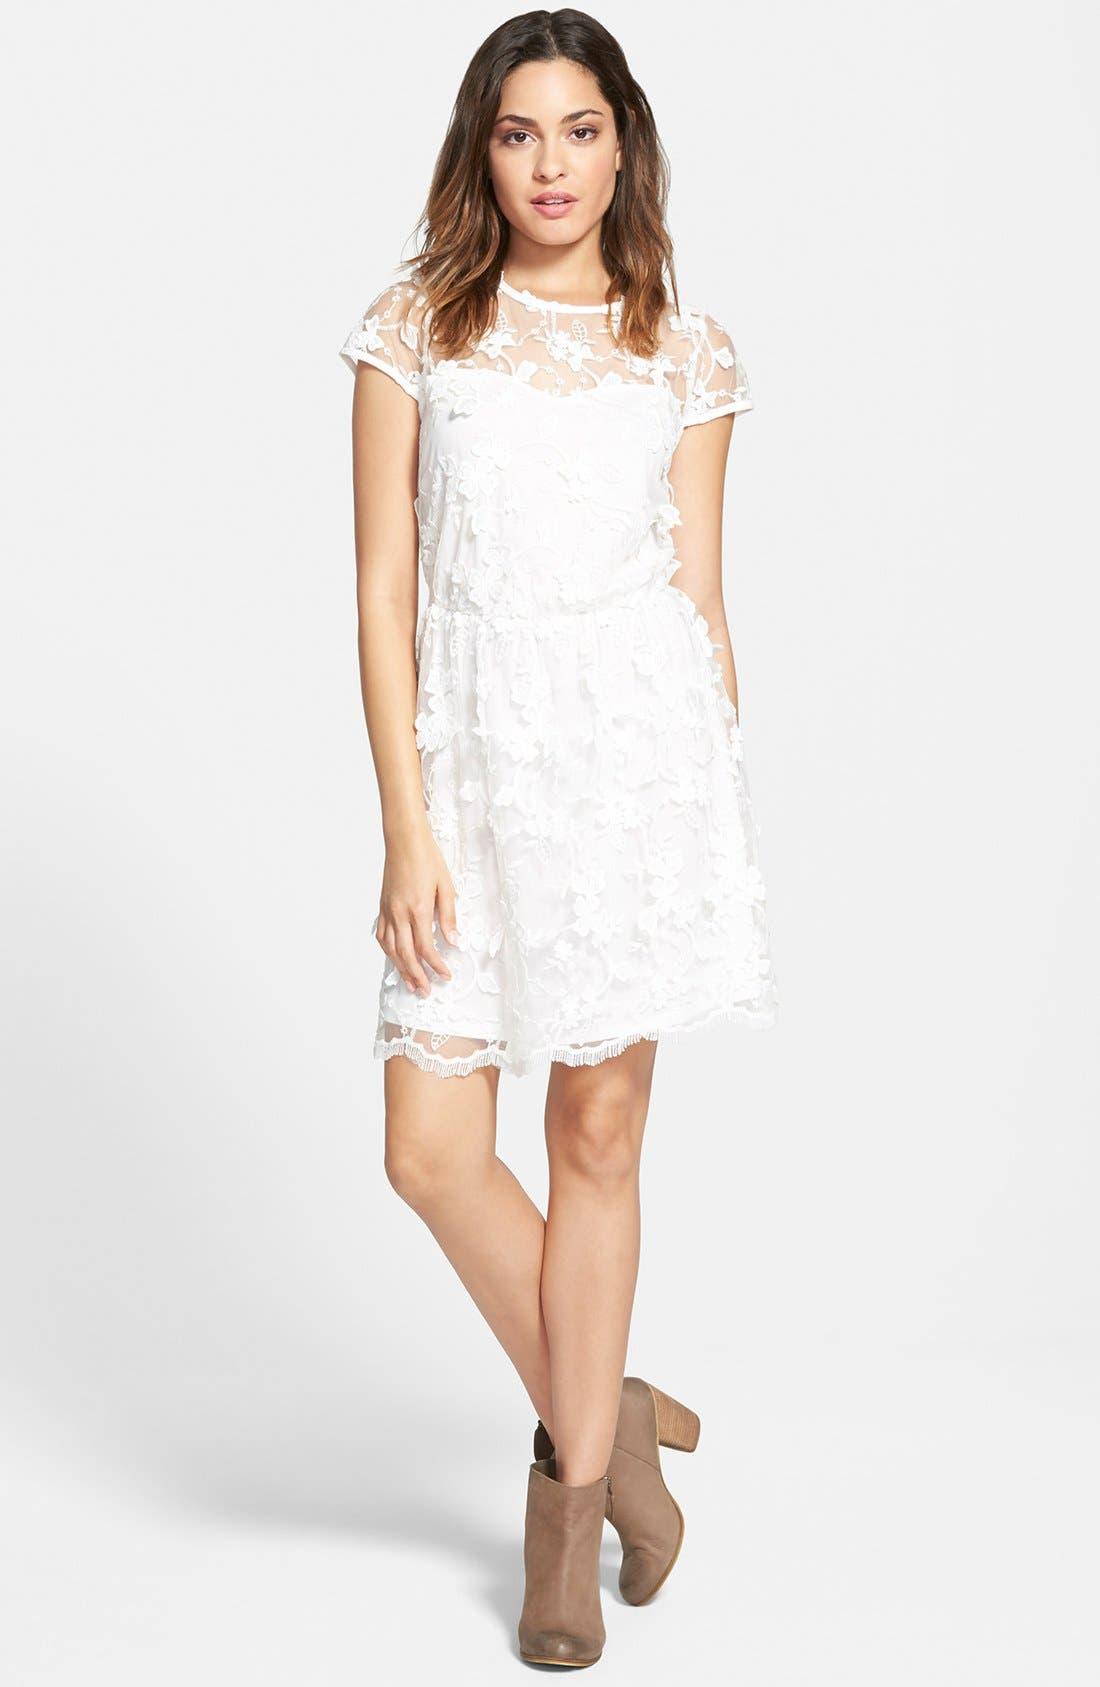 Alternate Image 1 Selected - Leola Couture Floral Embroidered Skater Dress